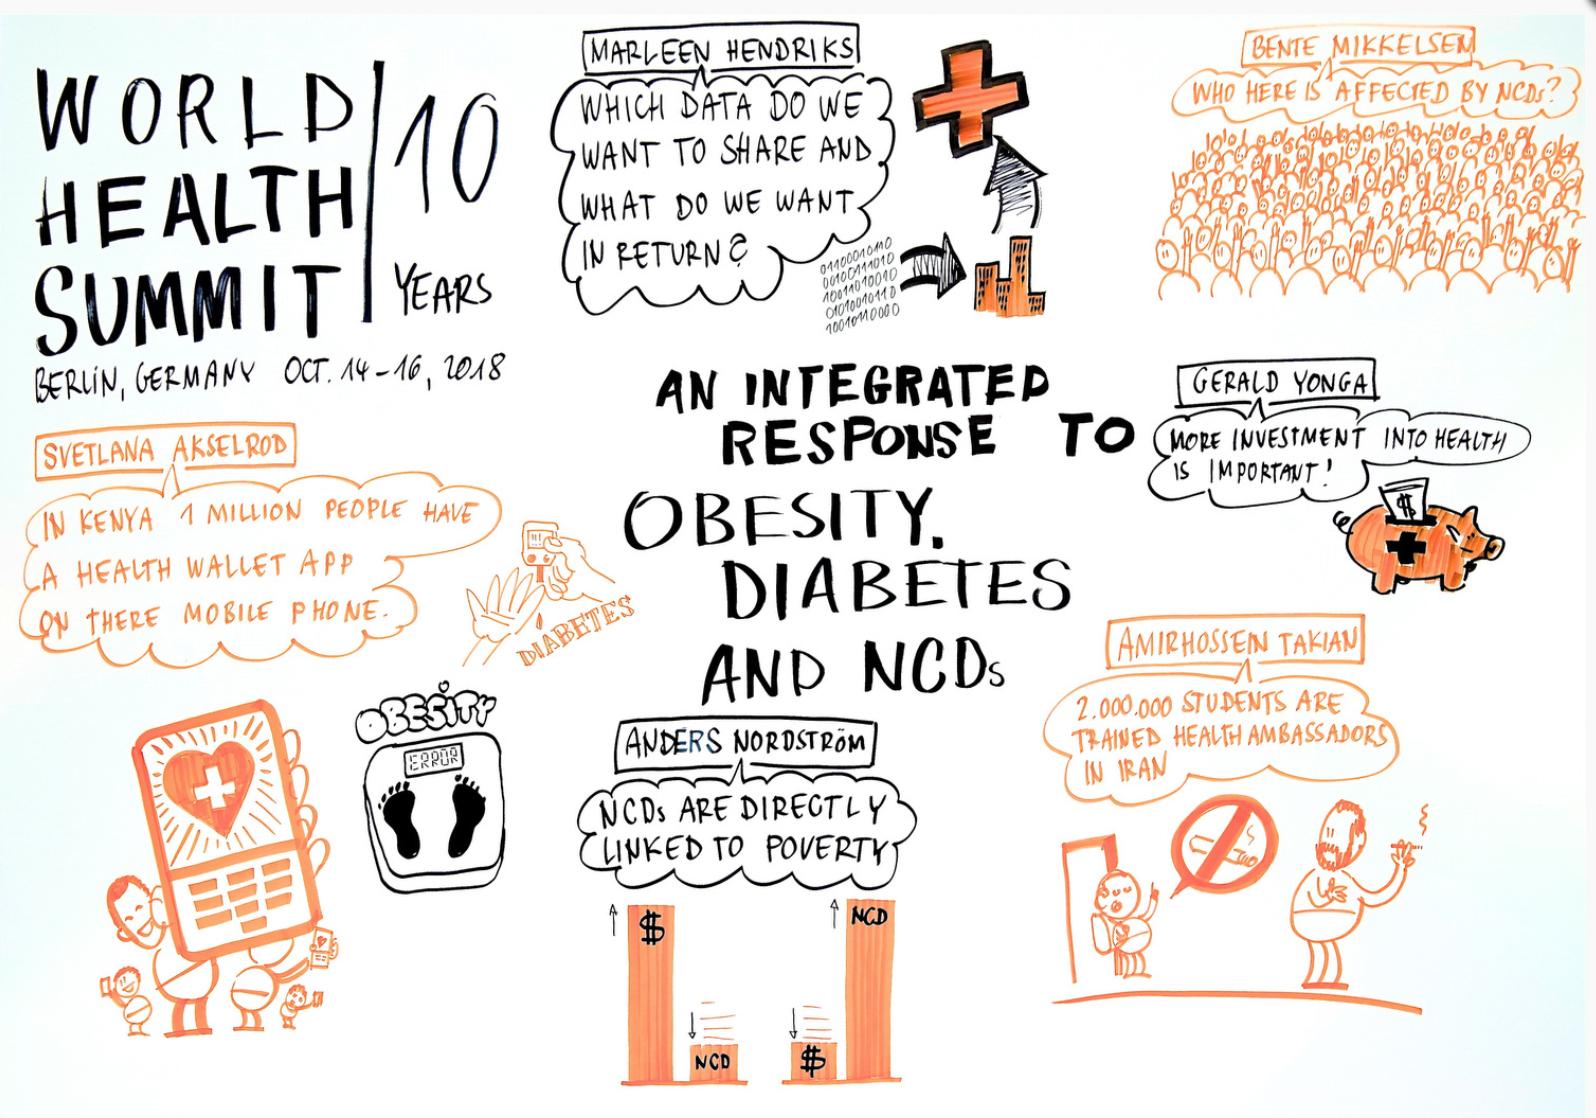 Photos via World Health Summit